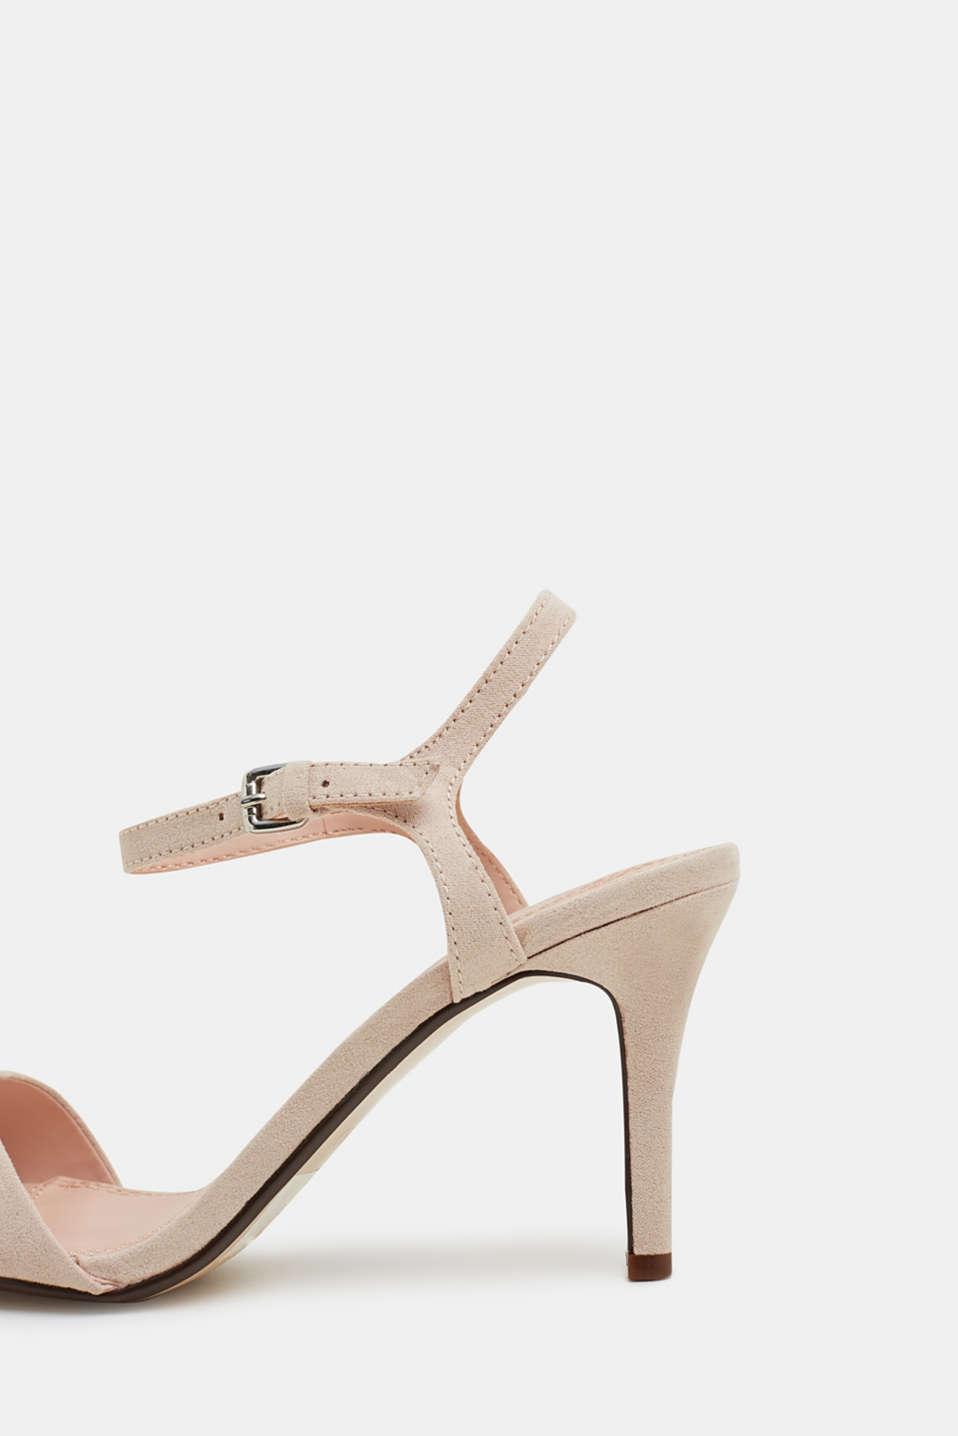 Faux suede sandals, SKIN BEIGE 2, detail image number 5